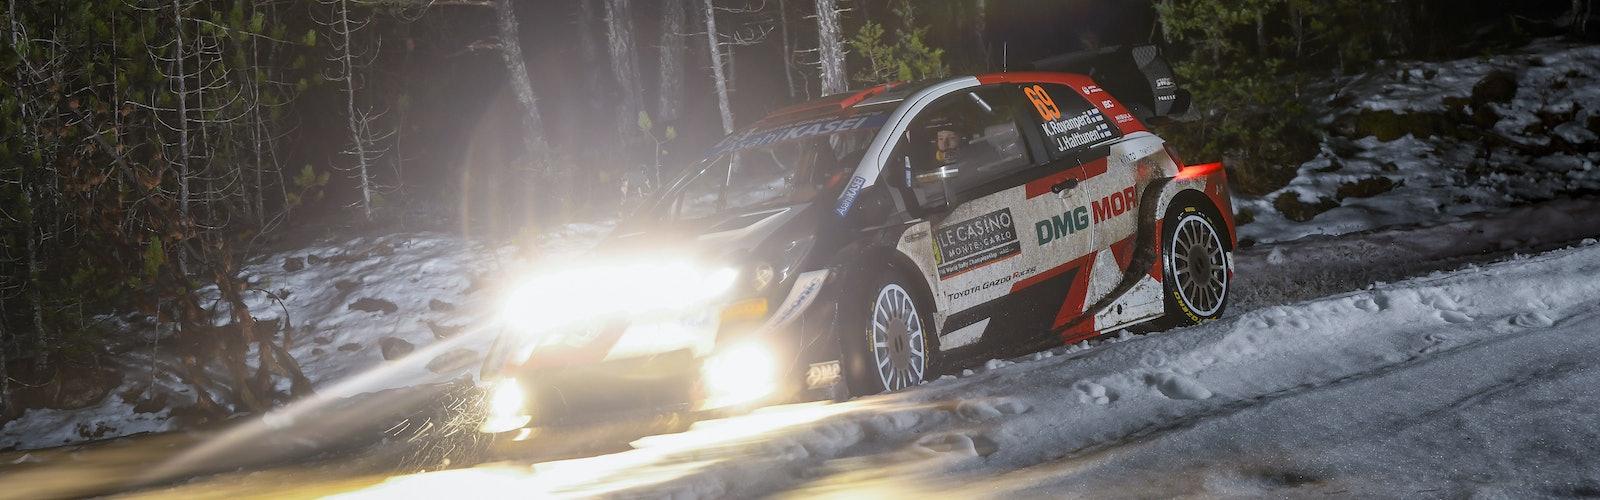 WRC_2021_Rd1._177